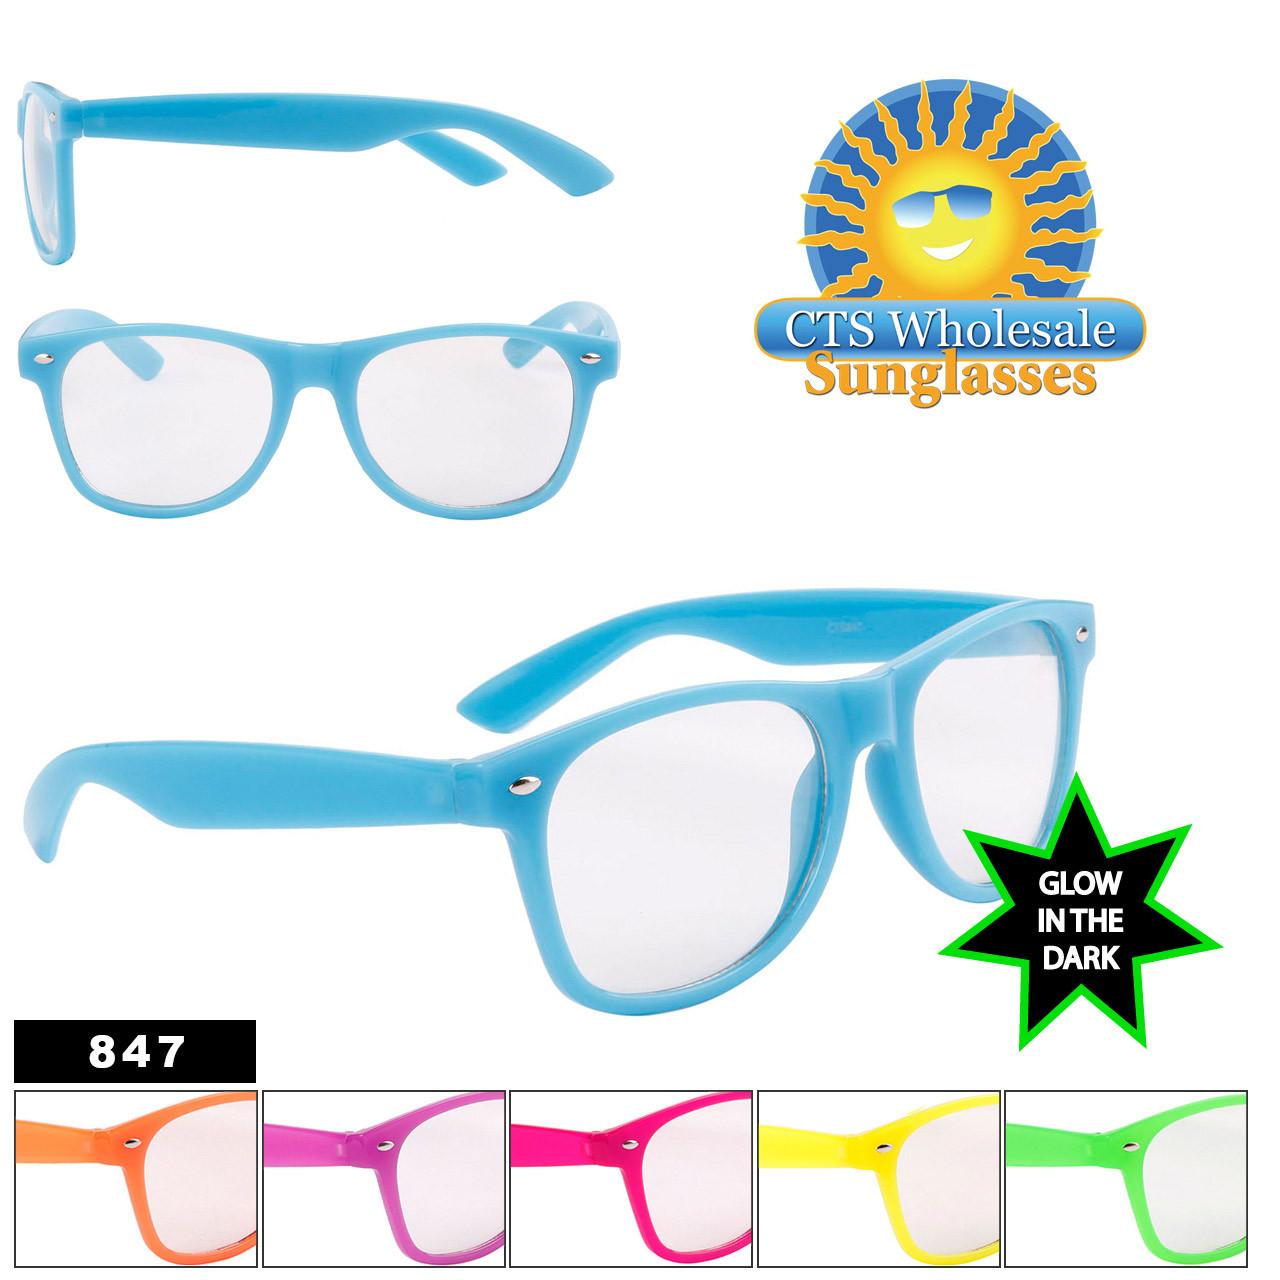 Glow in the Dark California Classics Sunglasses Wholesale - Style #847